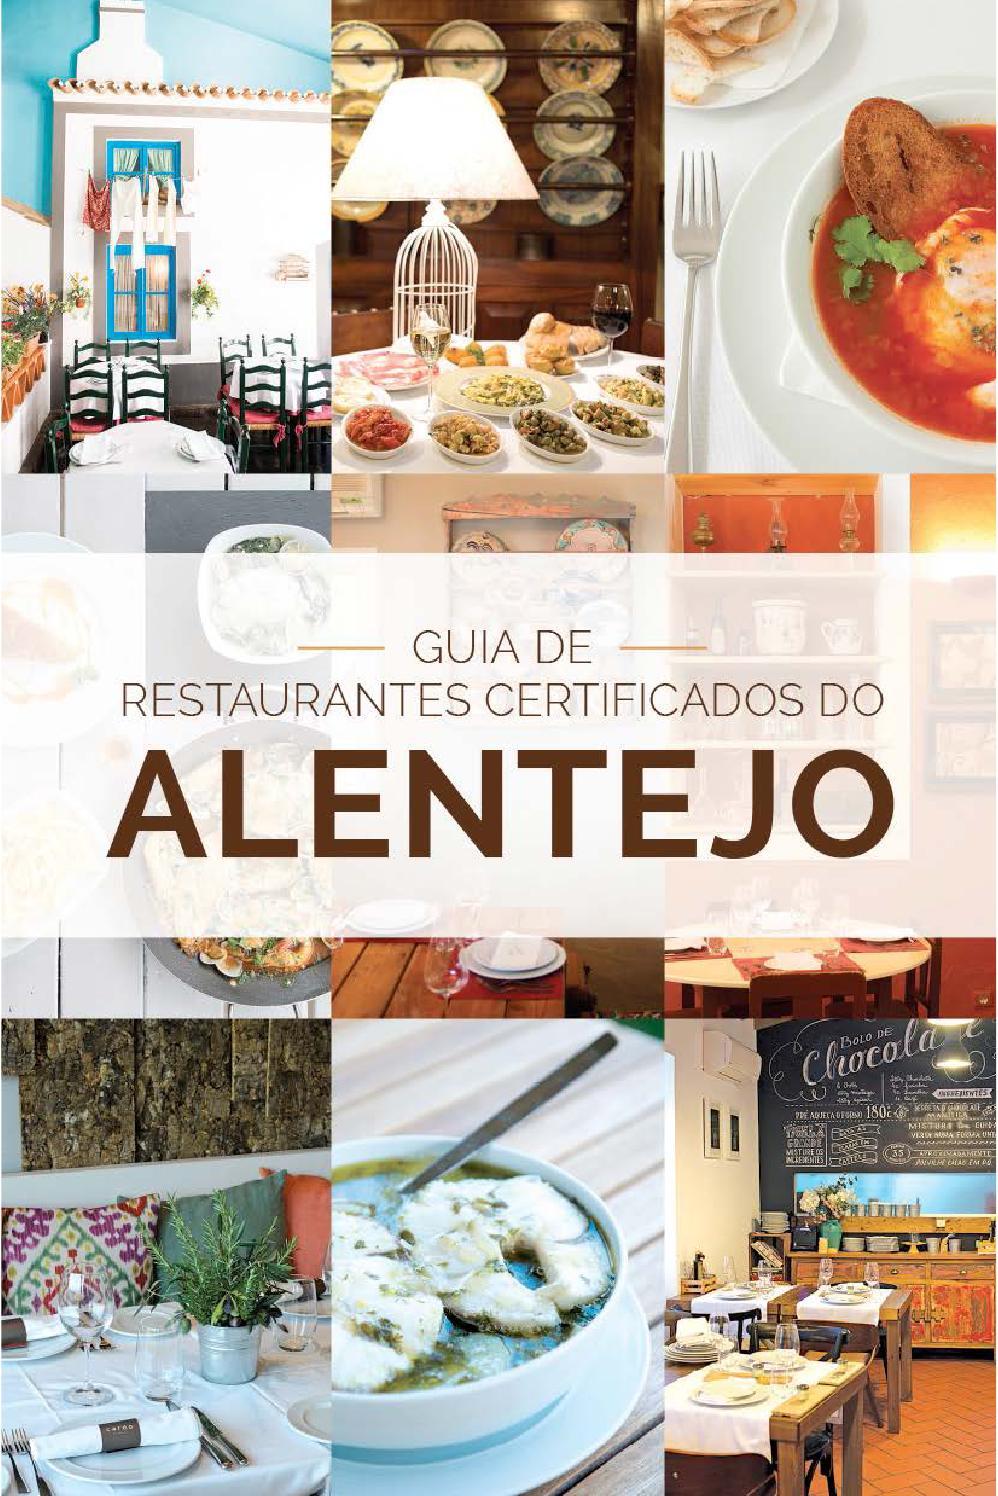 Guia de Restaurantes Certificados do Alentejo by Trendy